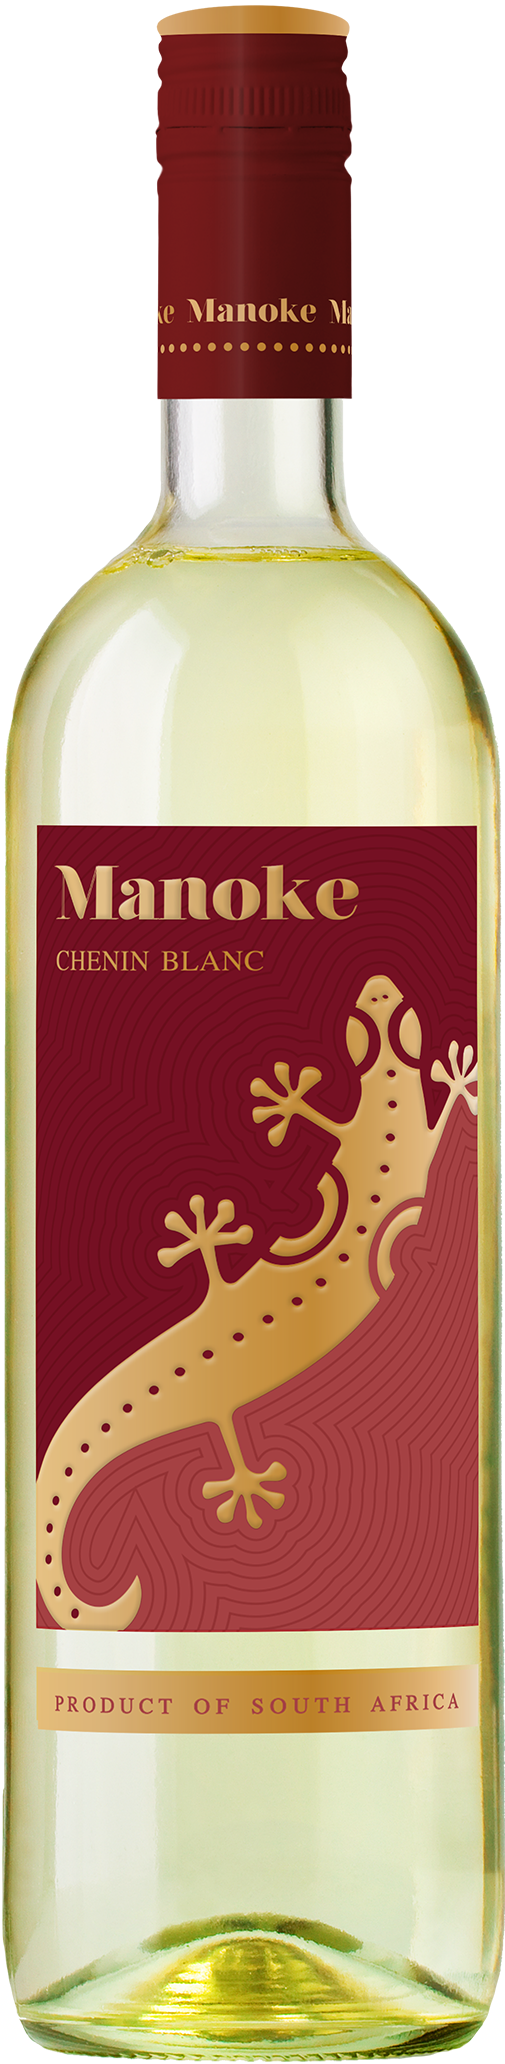 SouthAfrica_Manoke-white